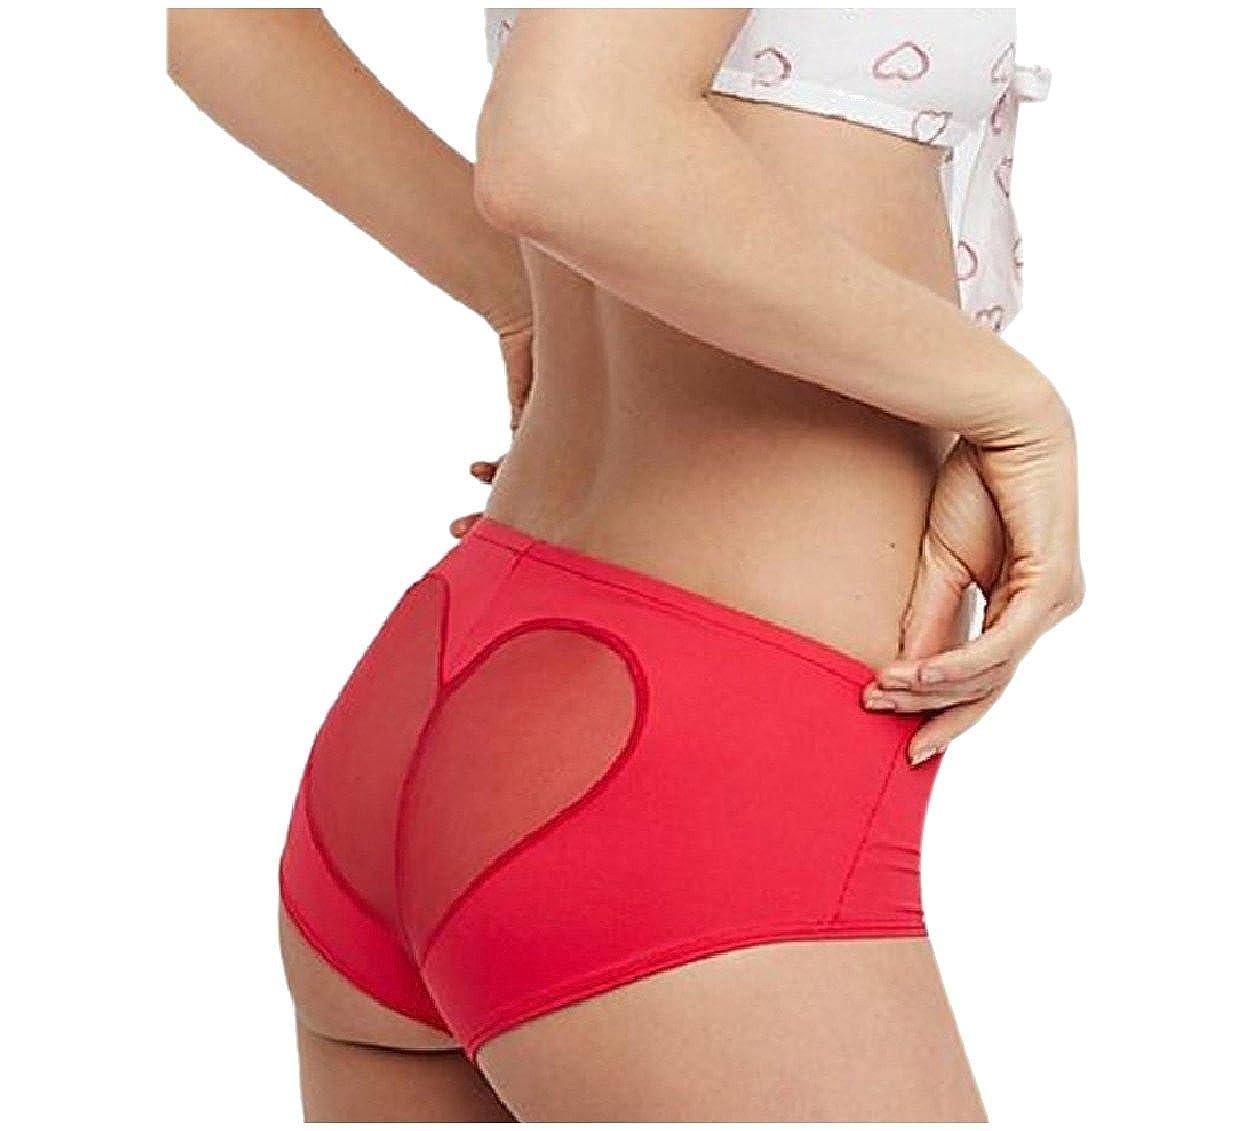 Abetteric Women's Low Waist Heart See-Through Underwear Panties Bikini